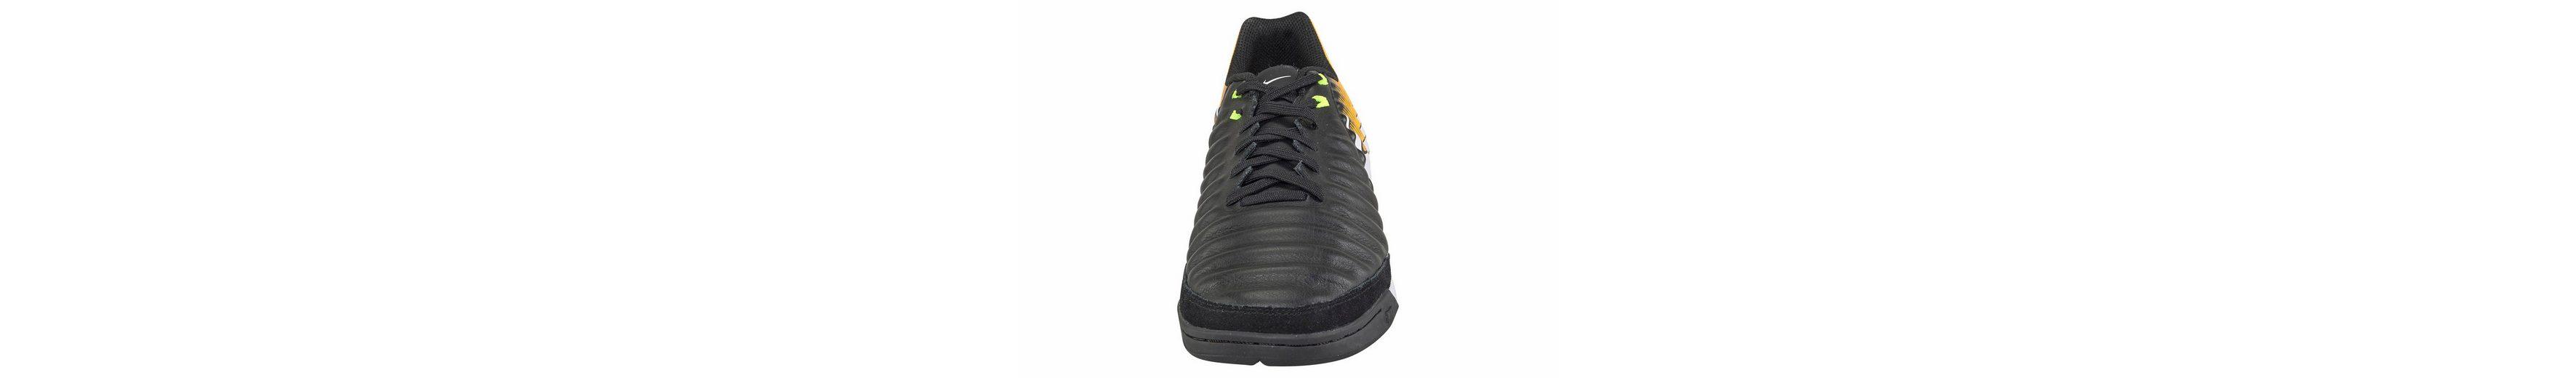 Nike Tiempox Ligera IV IC Fußballschuh Billig Verkauf Neueste ua1sXQnl3u